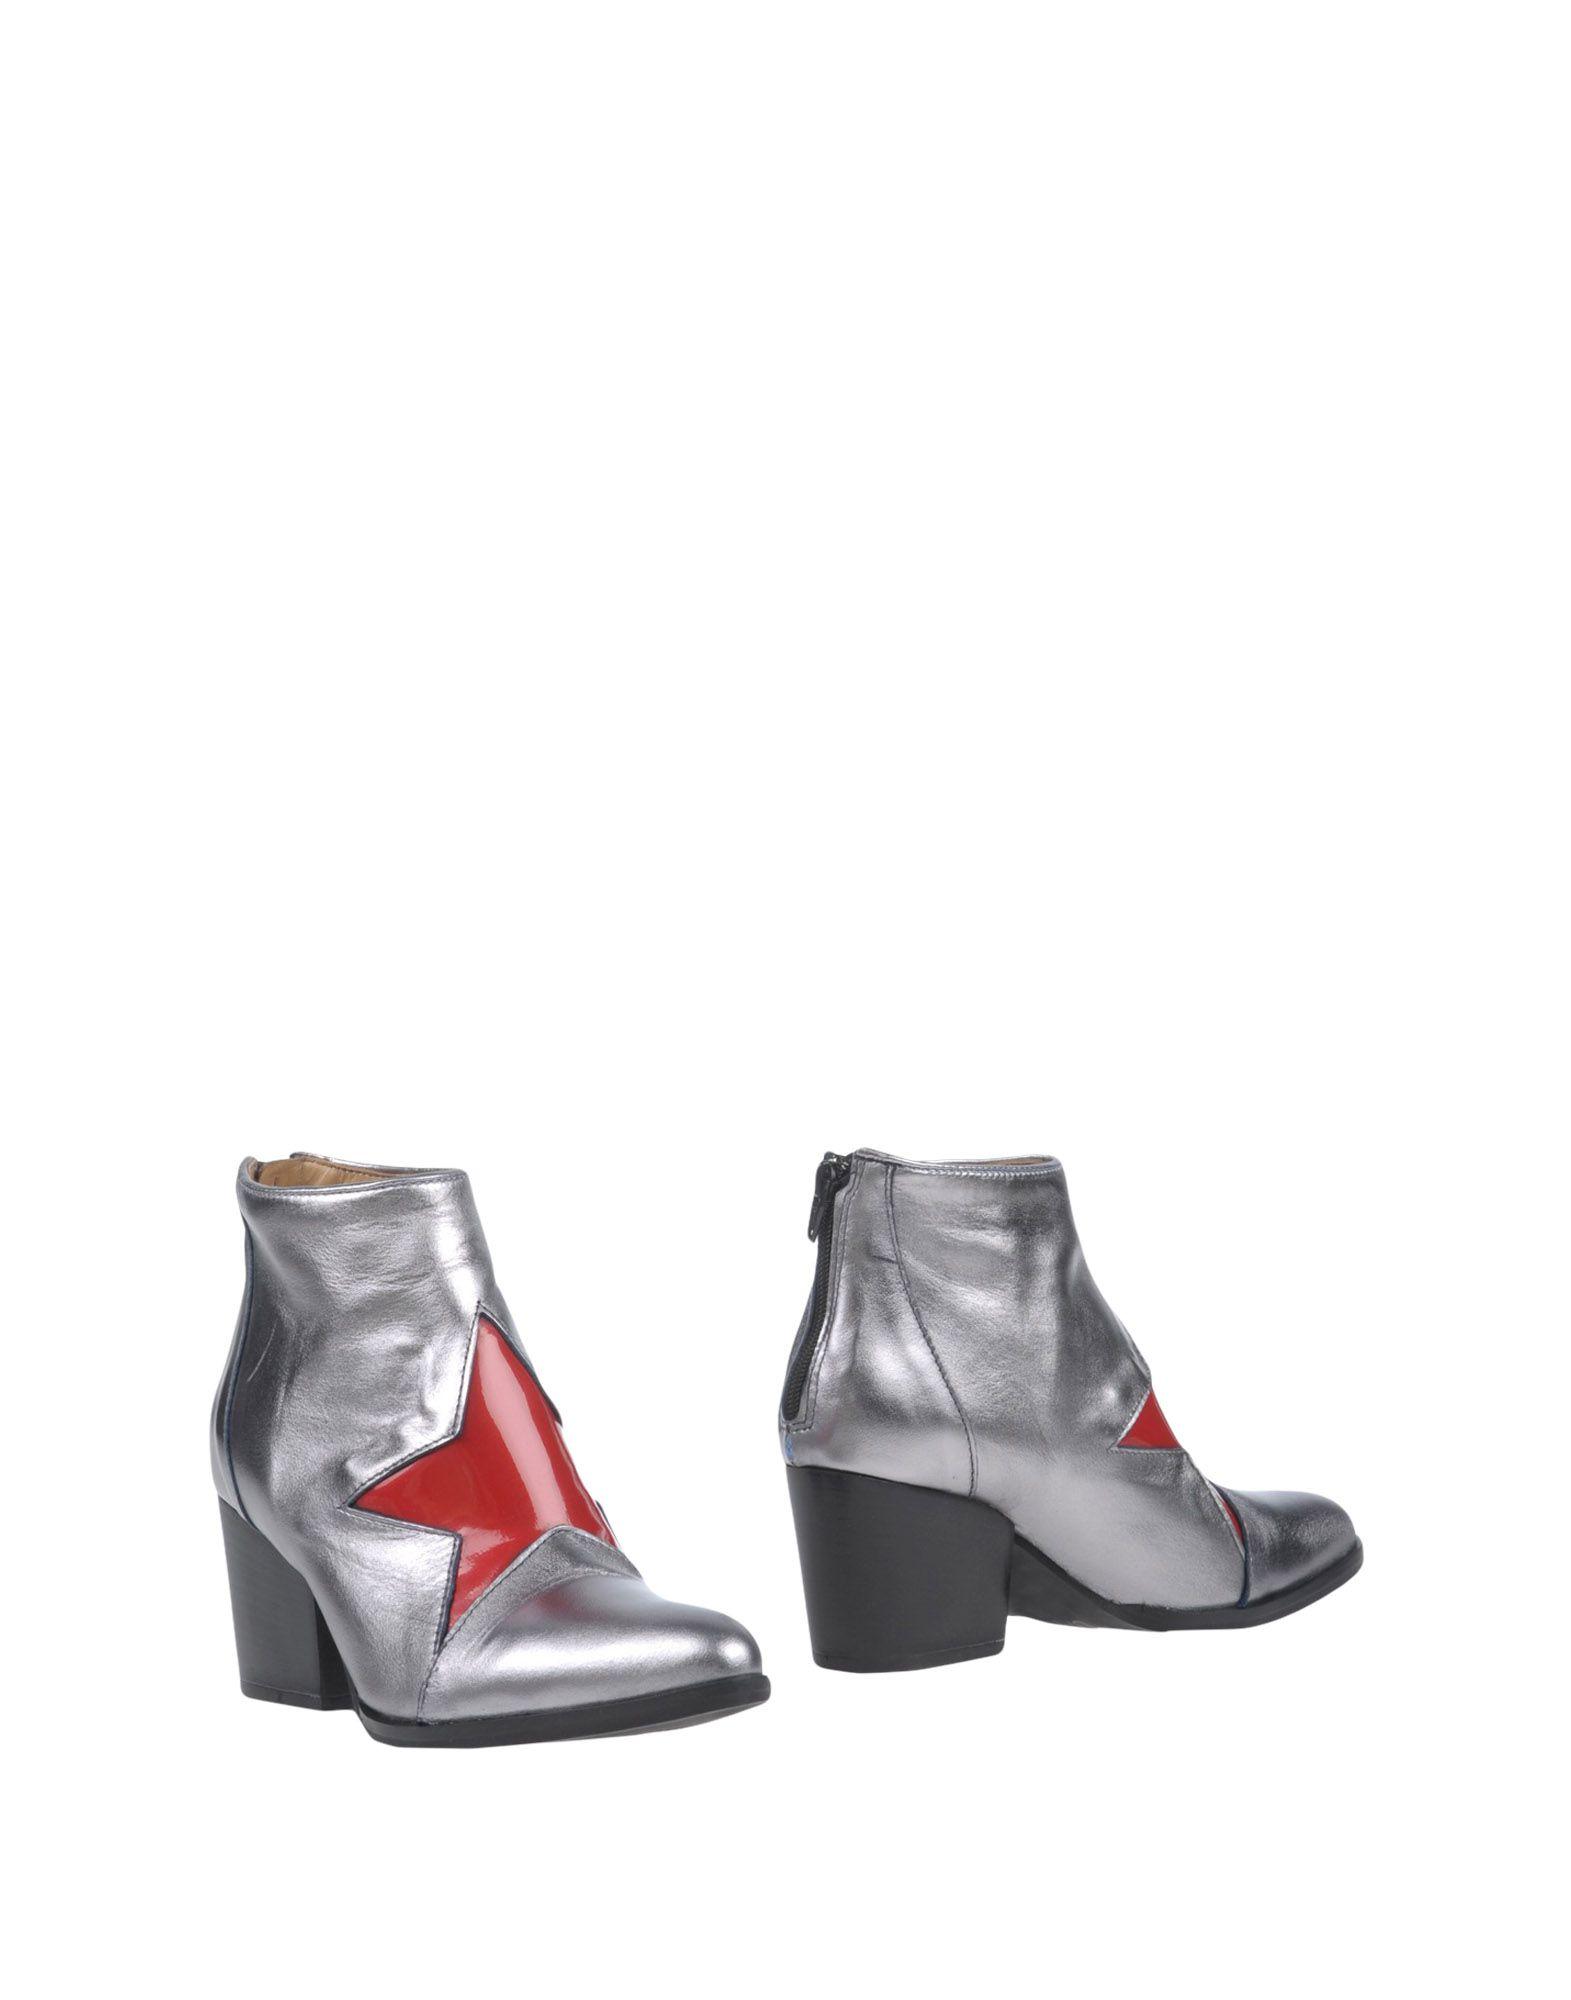 Unlace 11373731BI Stiefelette Damen  11373731BI Unlace Gute Qualität beliebte Schuhe 86b31f